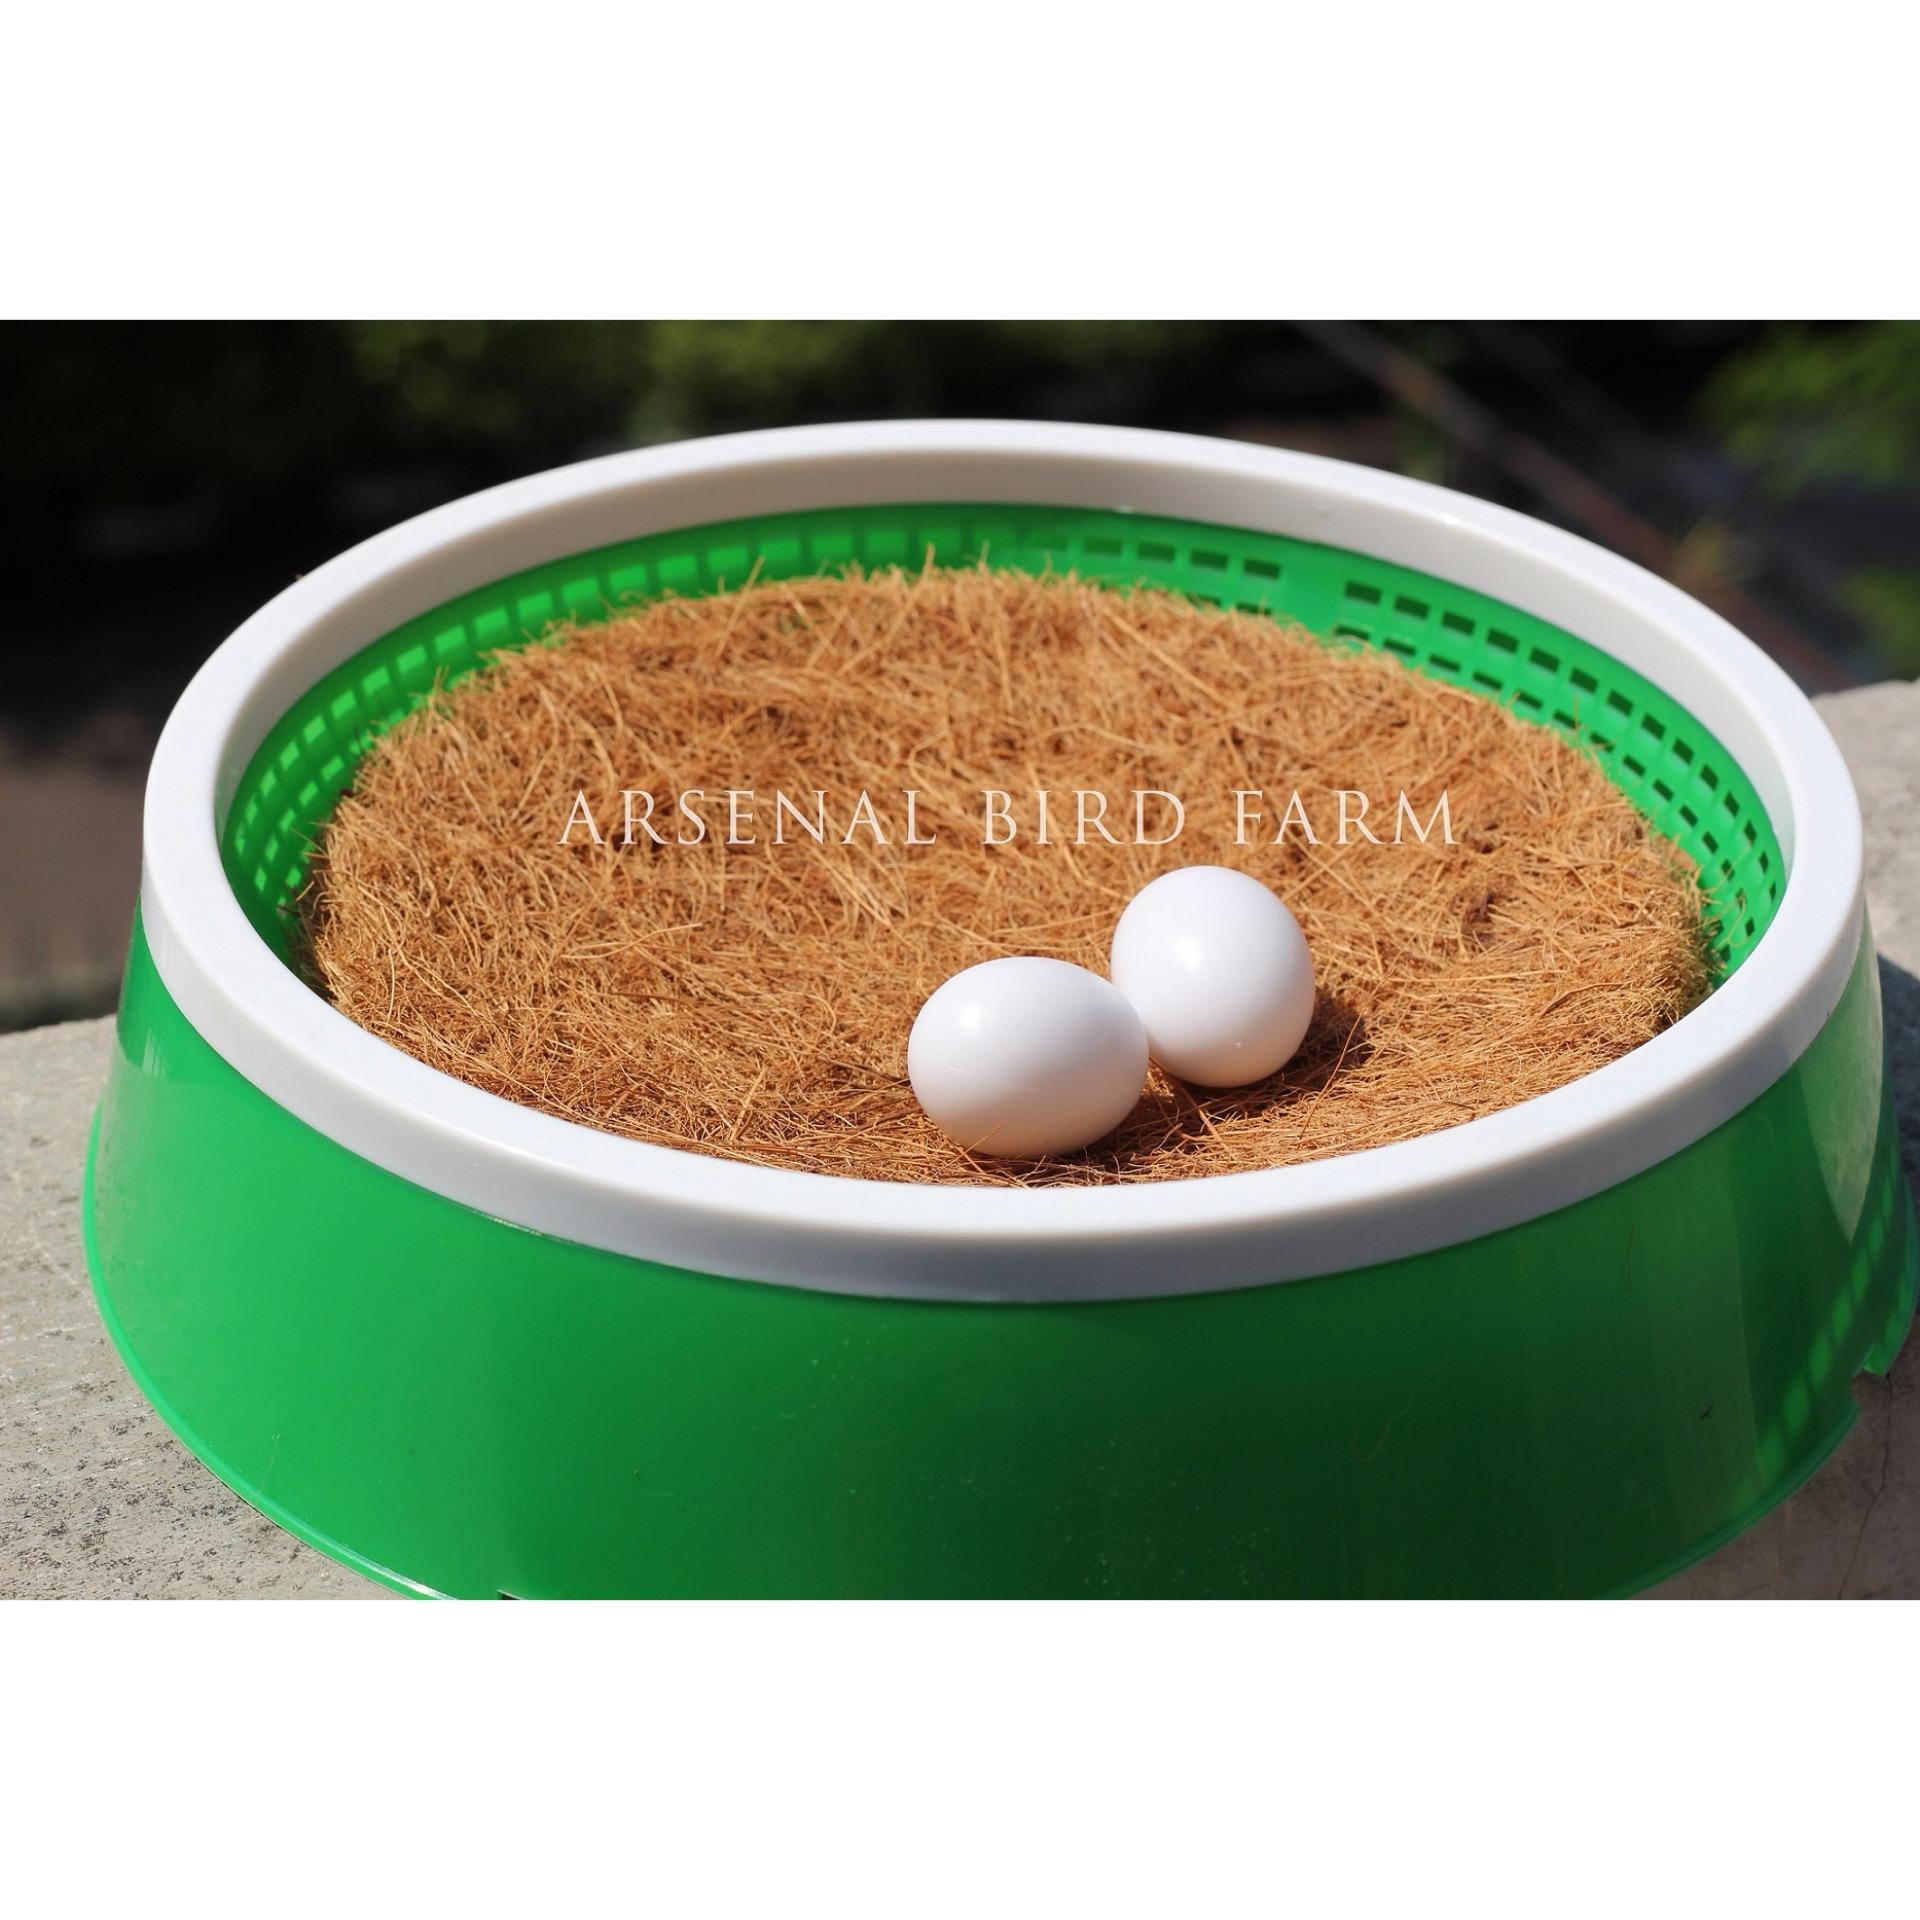 Telor Palsu Merpati / Dummy Egg / Plastic Egg / Telor Plastik